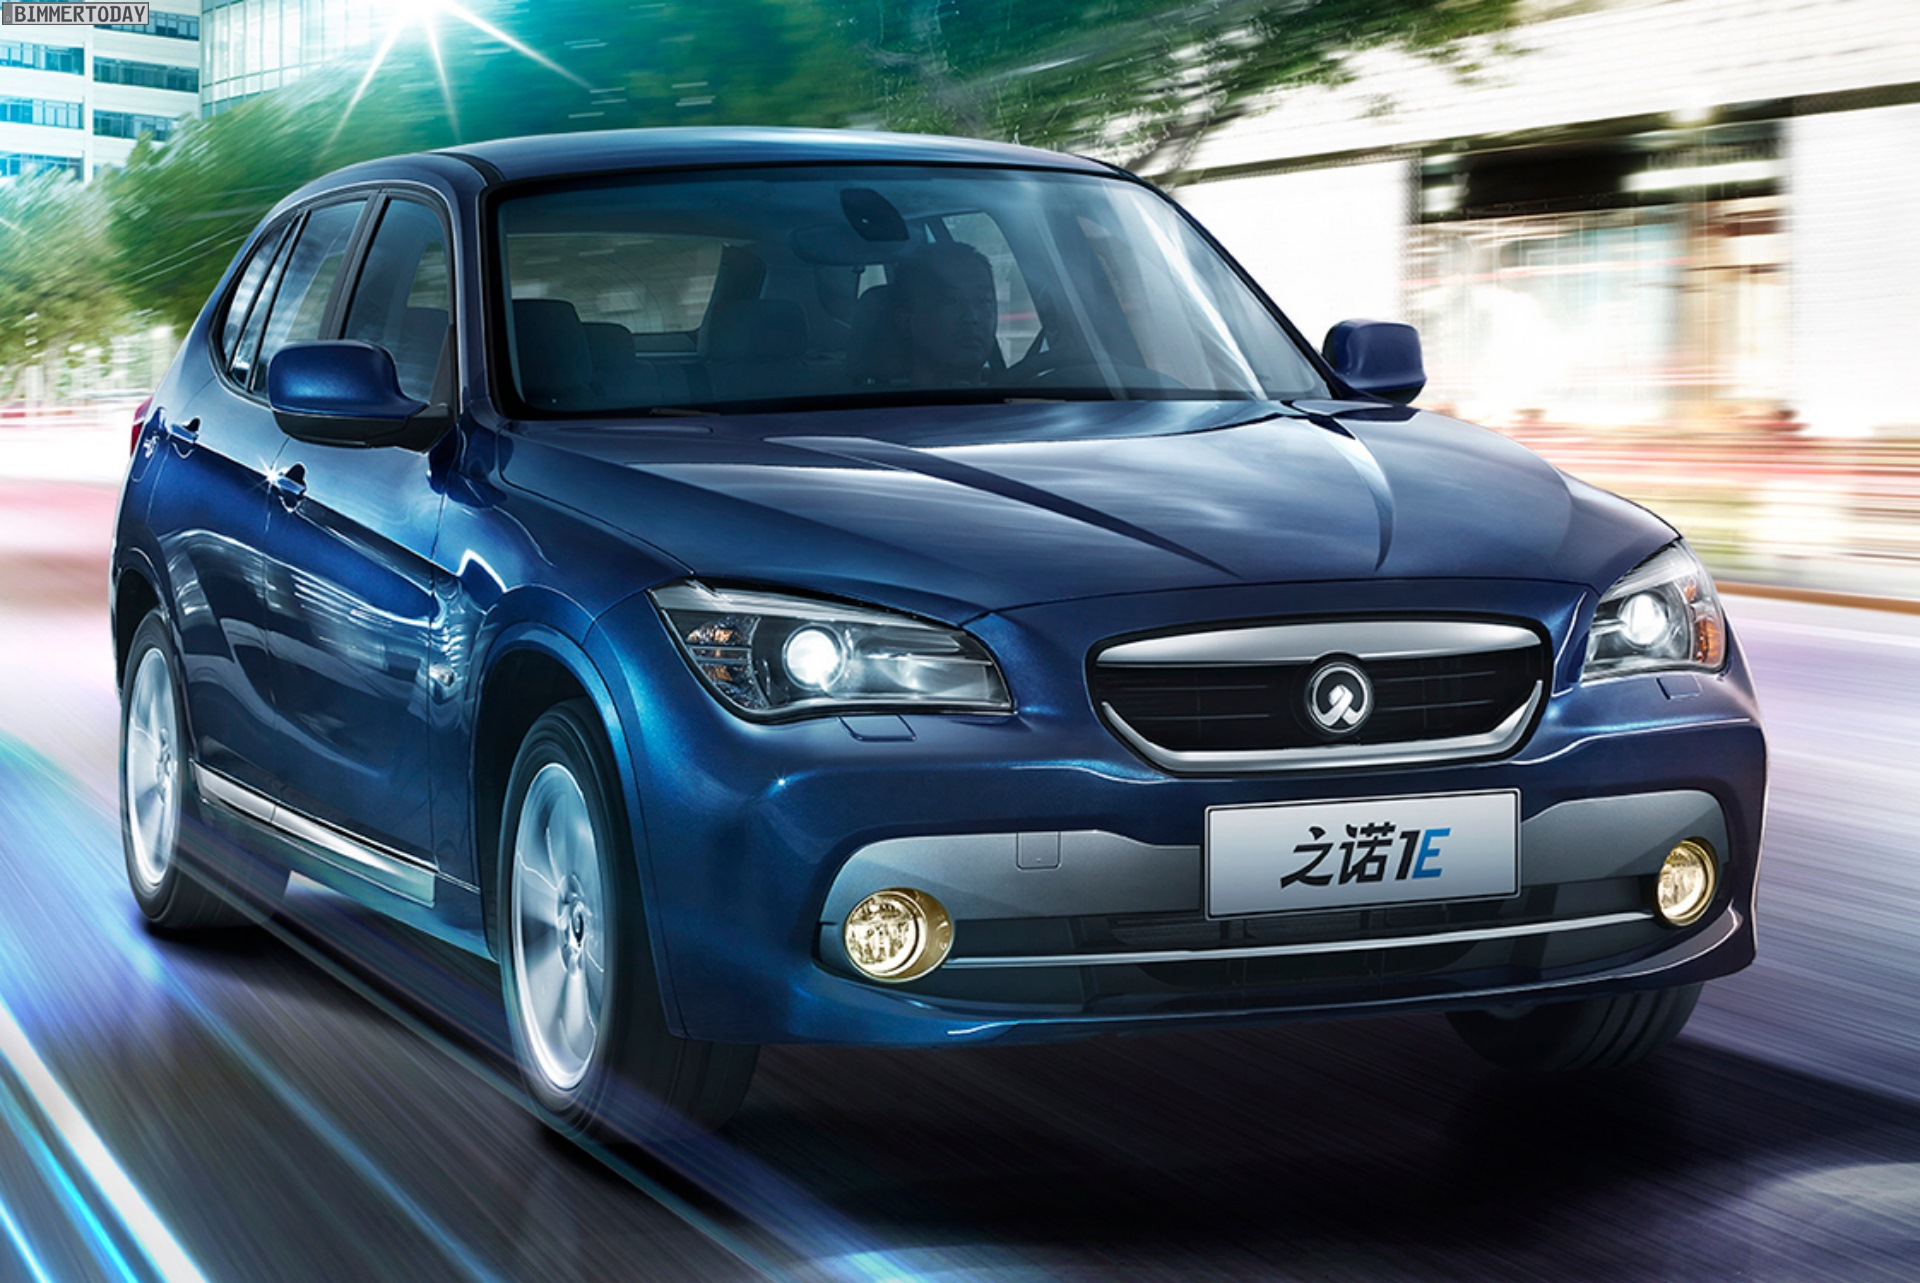 Zinoro 1E BMW X1 China Elektro SUV Guangzhou 2013 11